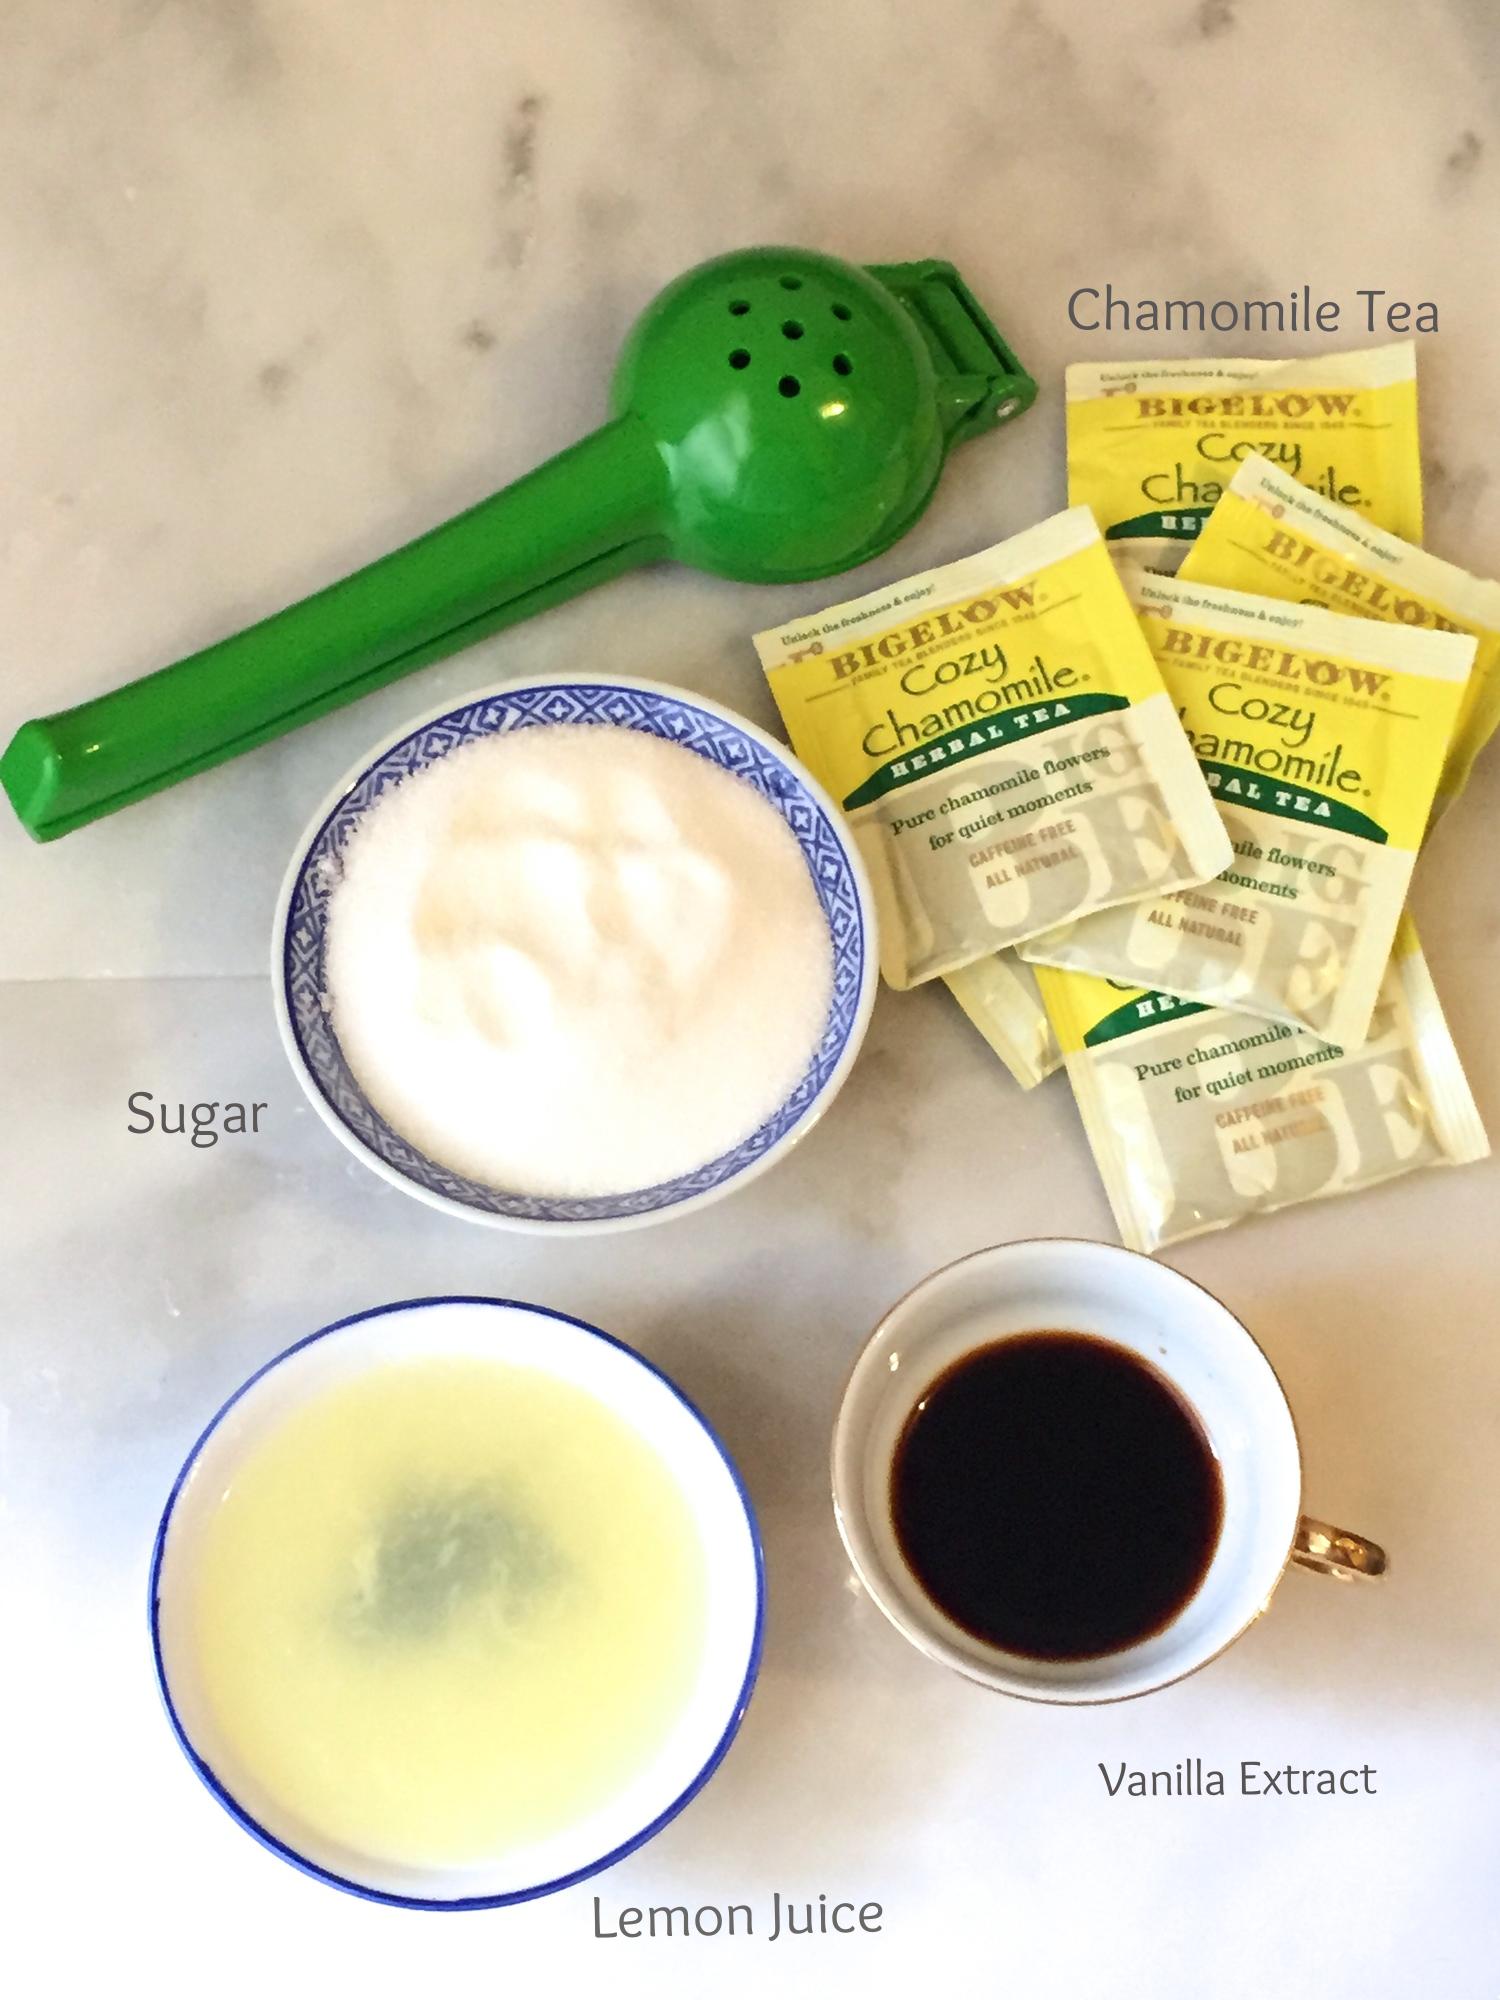 Sugar, chamomile tea bags, vanilla extract, and lemon juice